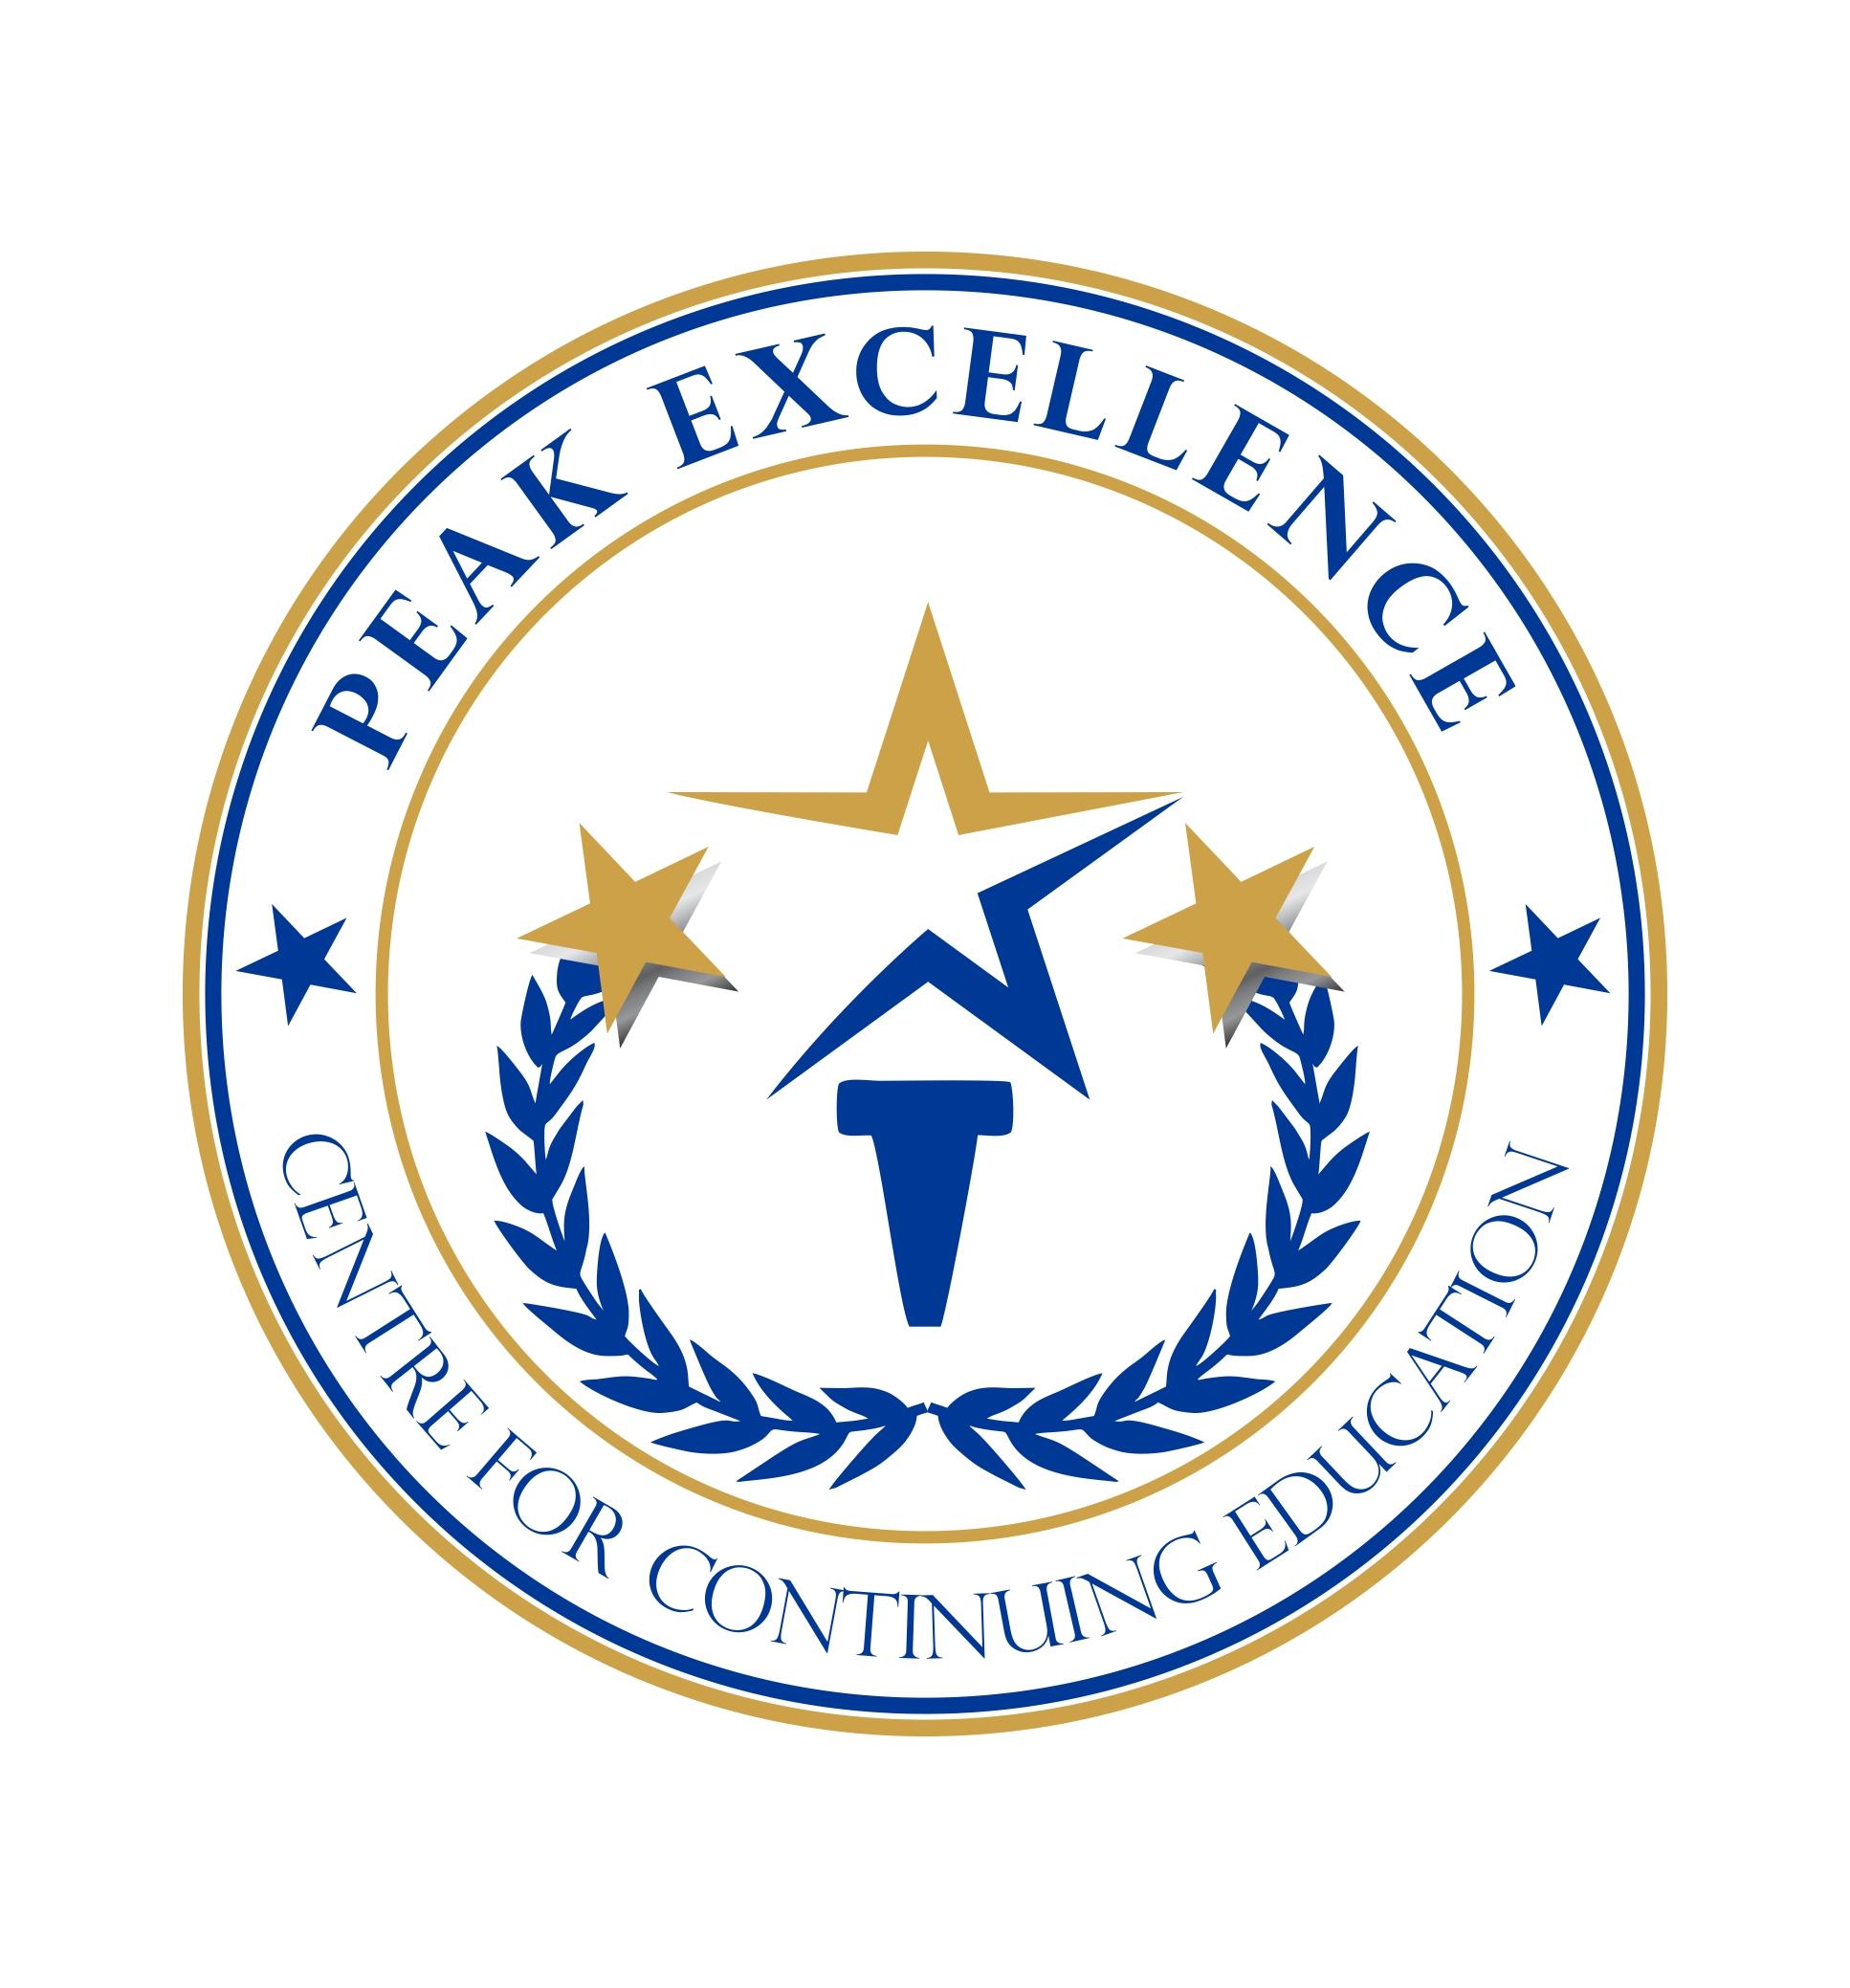 Peak Excellence